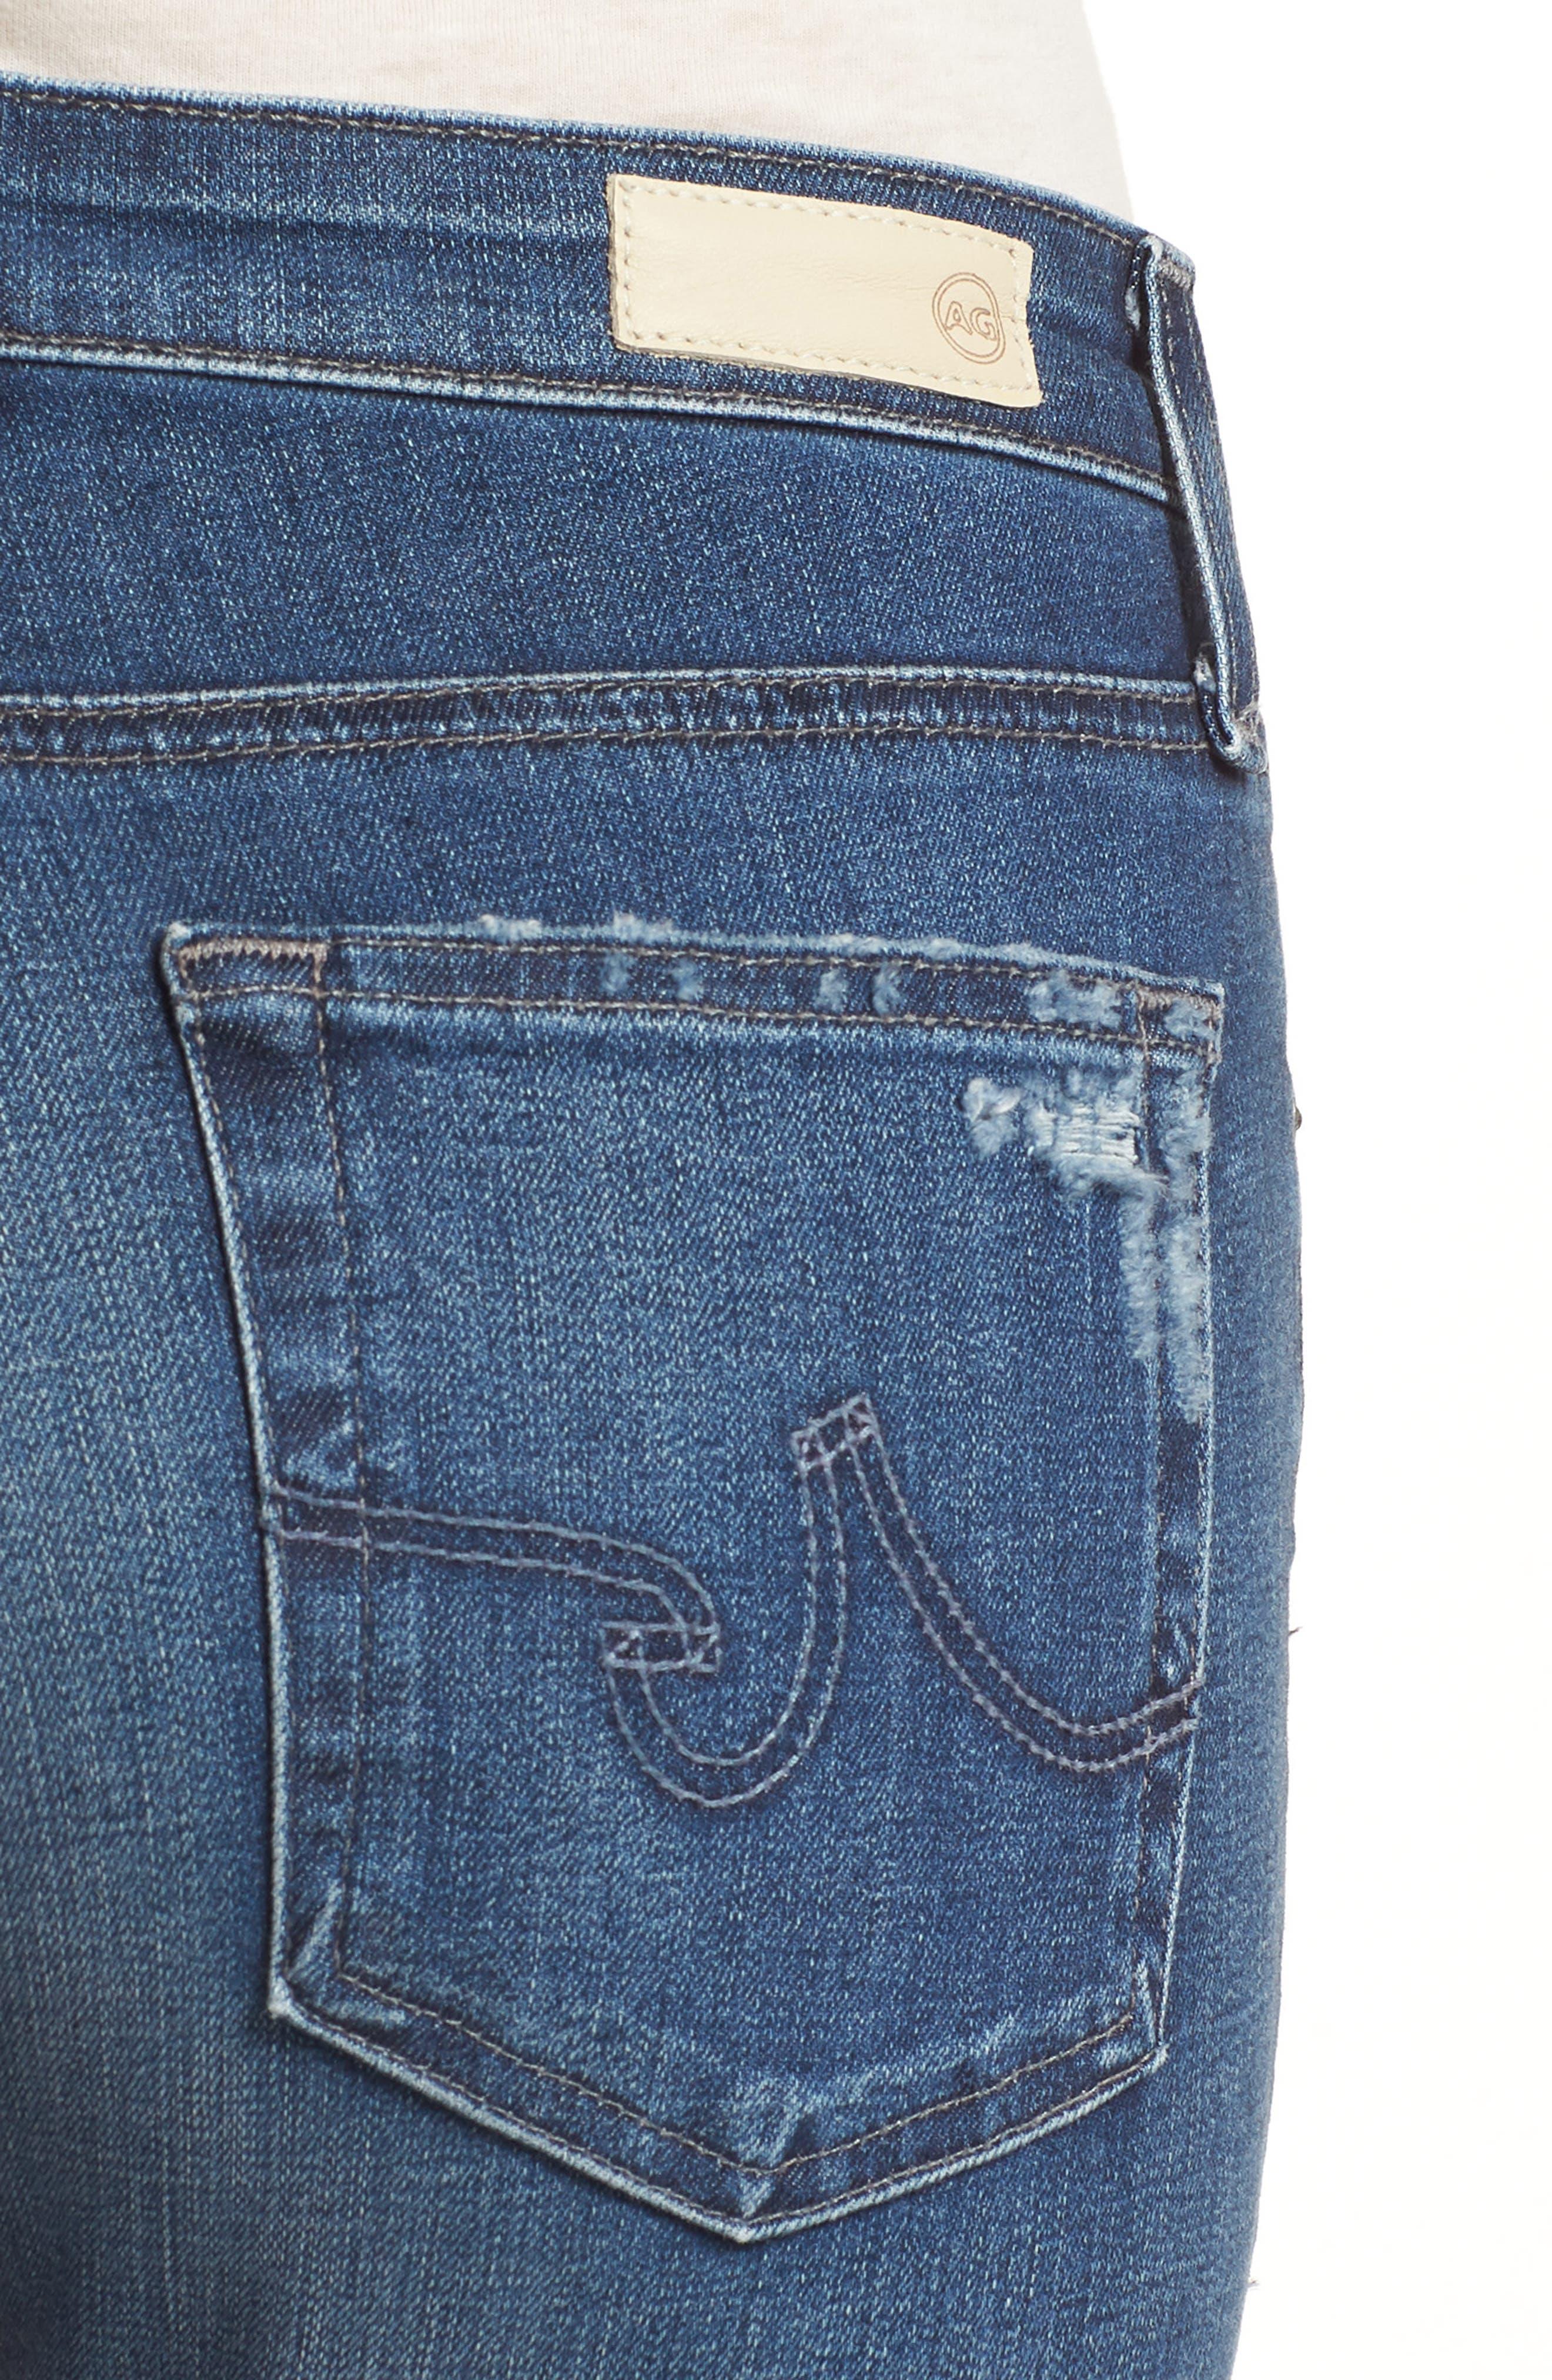 'The Farrah' High Rise Skinny Jeans,                             Alternate thumbnail 34, color,